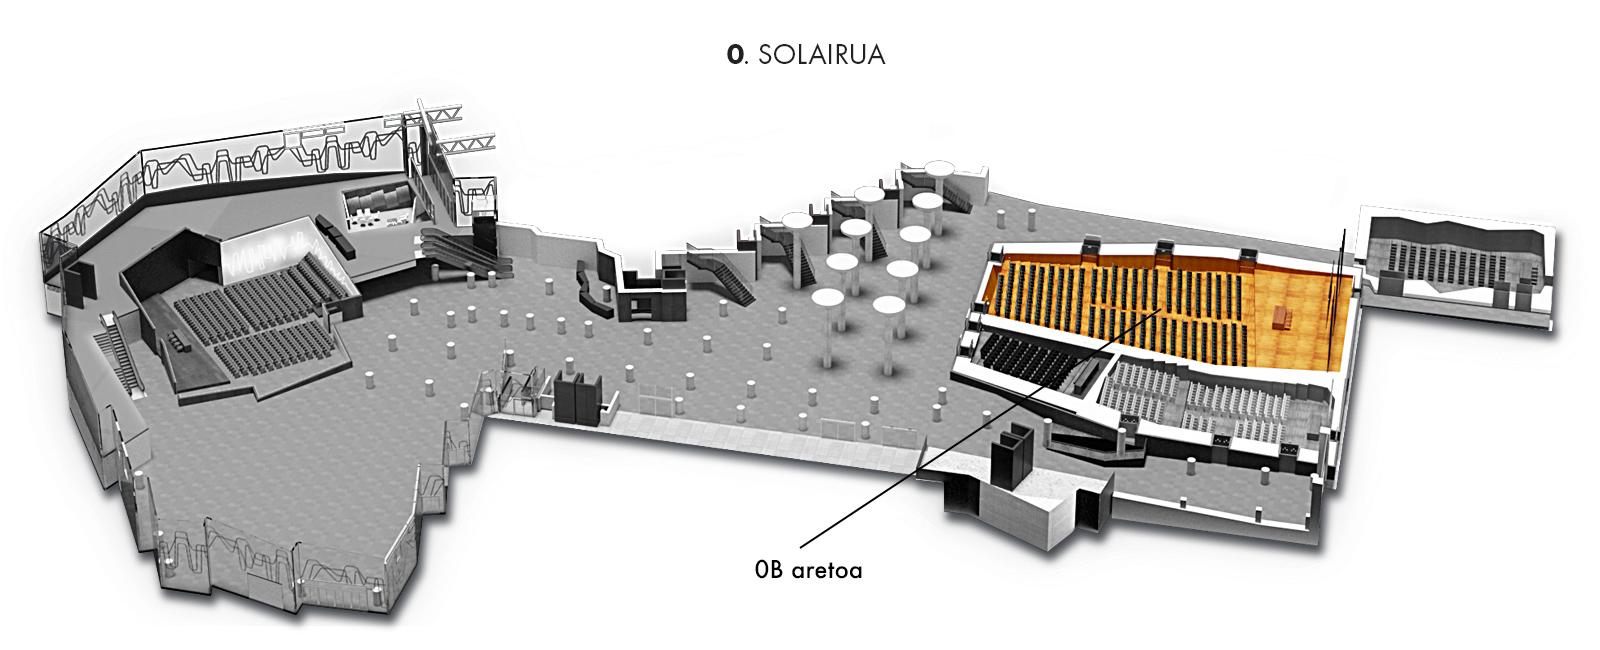 0B aretoa, 0. solairua | Palacio Euskalduna Jauregia